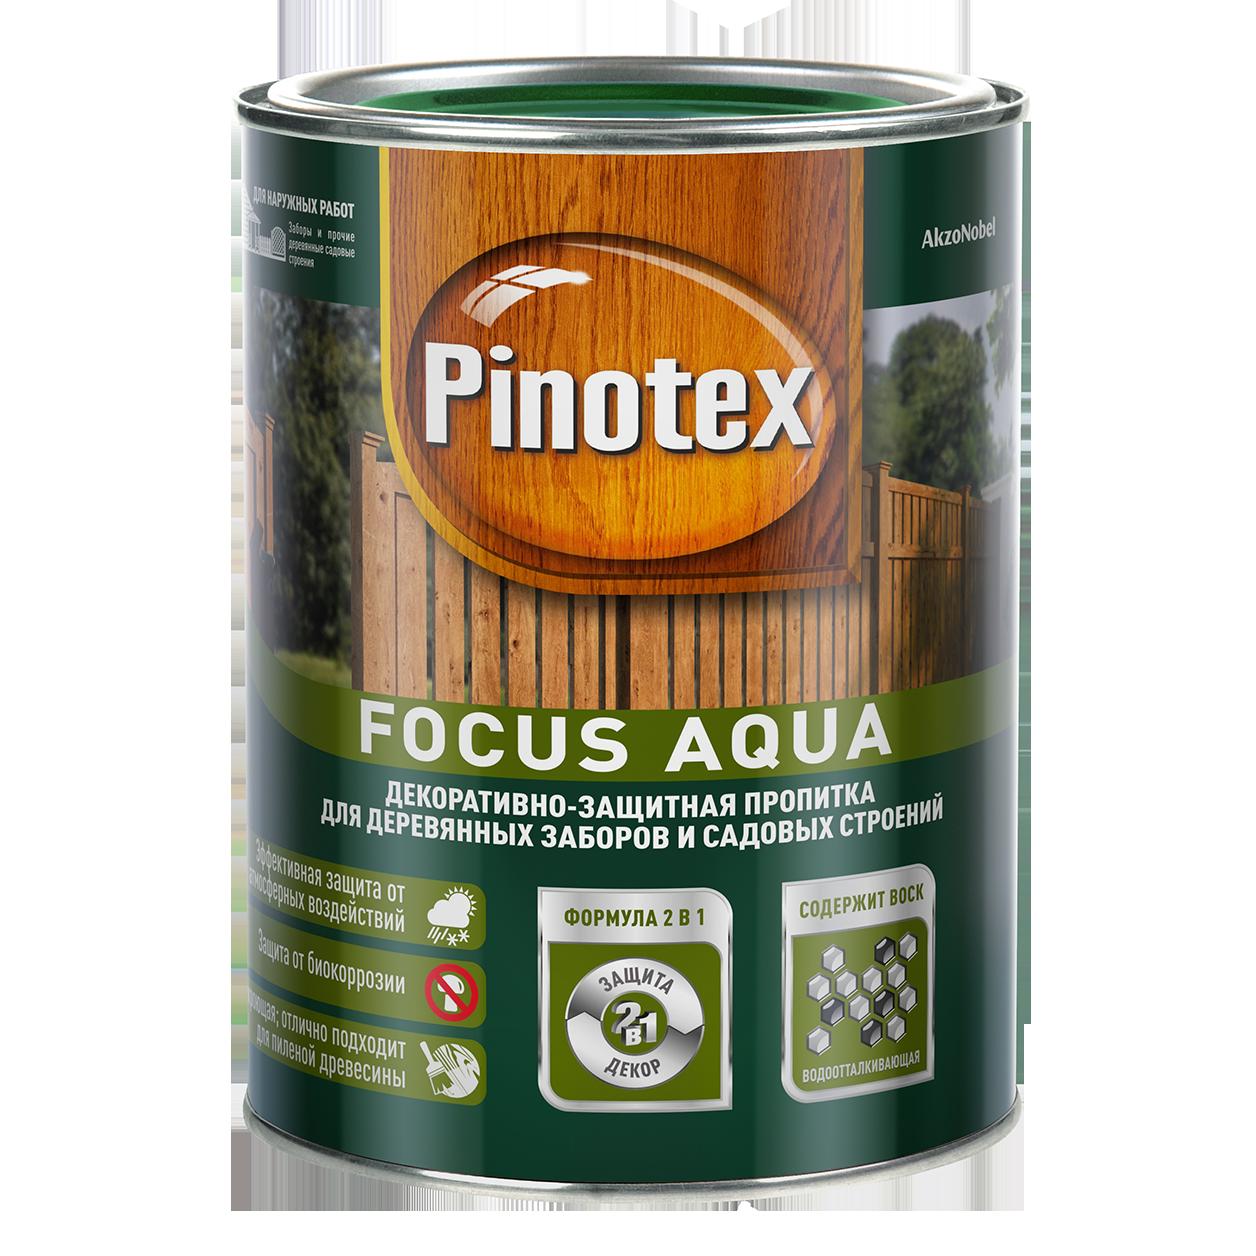 Pinotex Focus Aqua